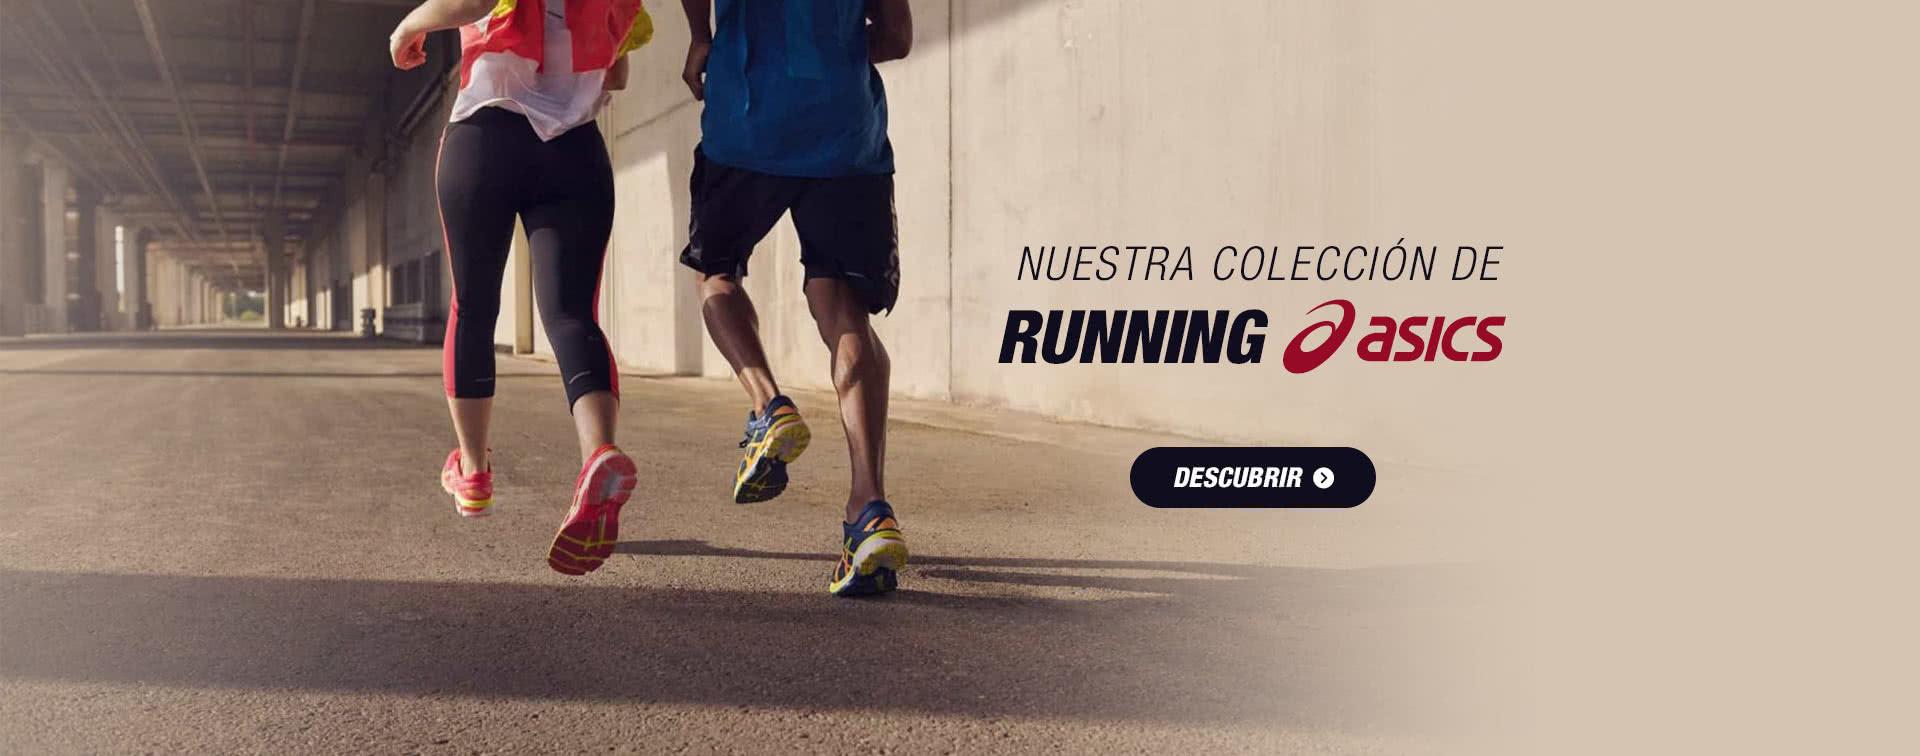 Training Fit devient Sport is Good